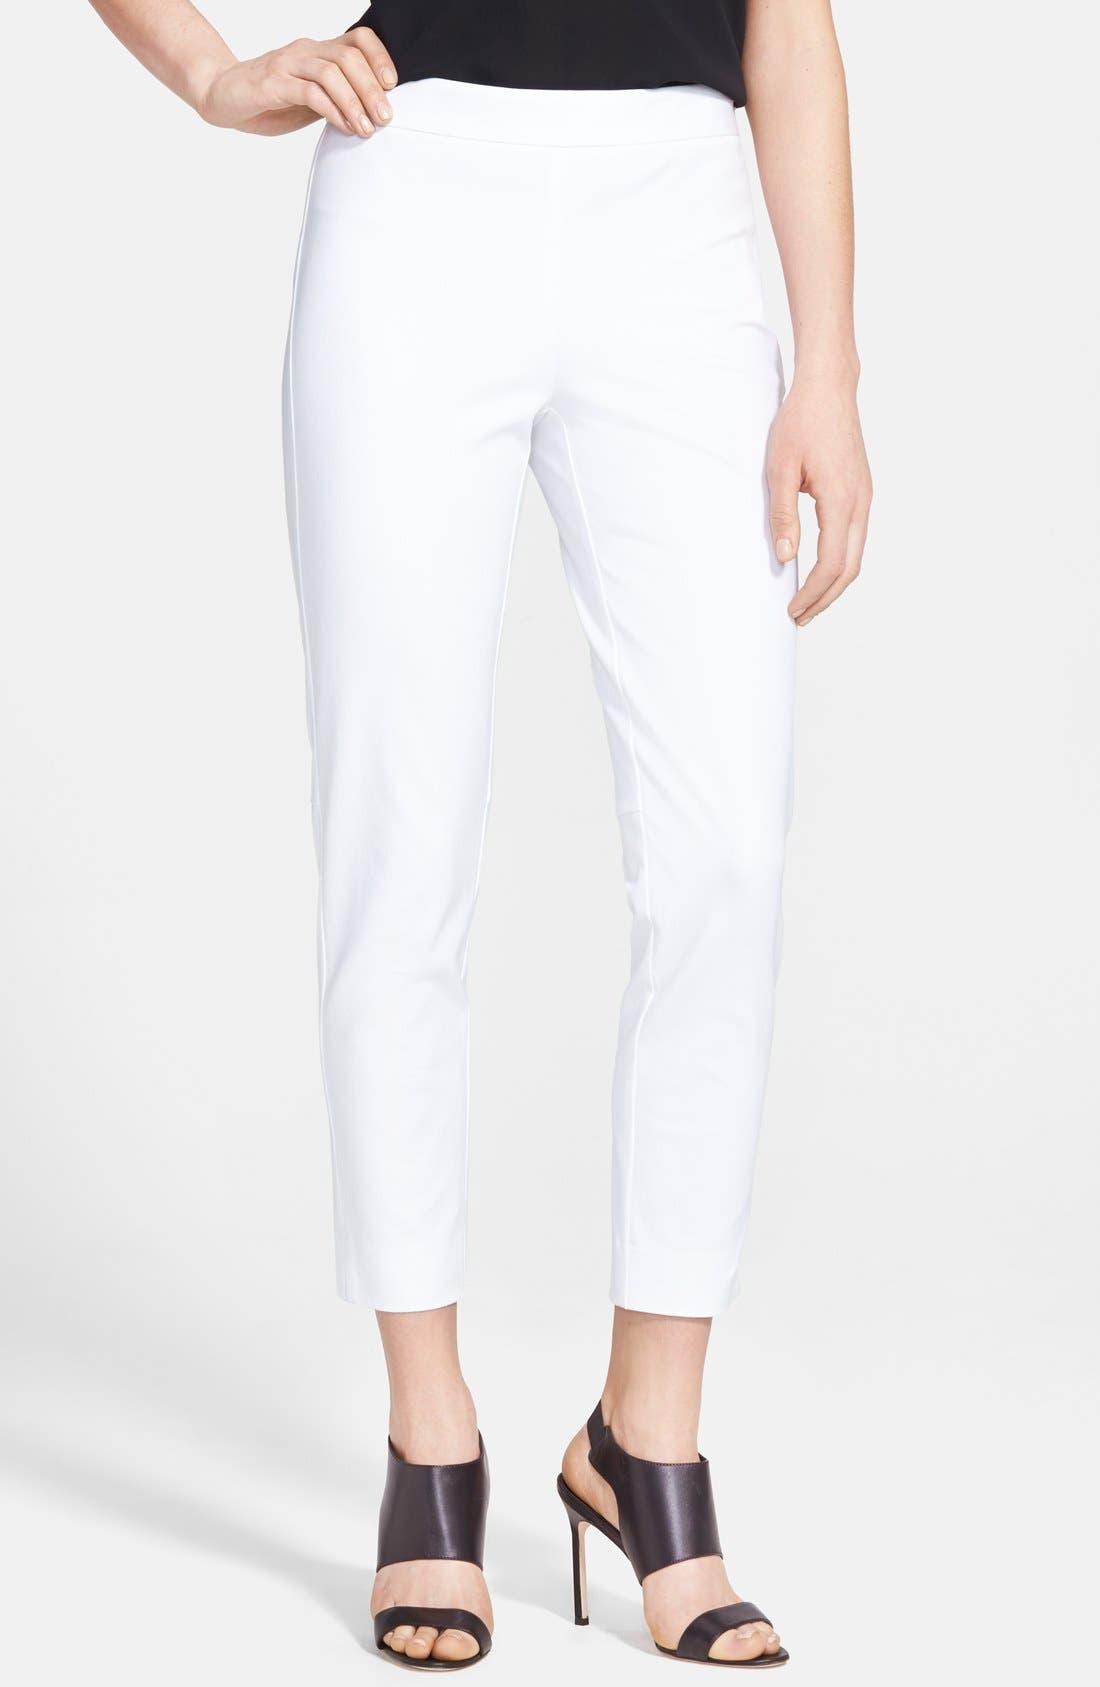 Alternate Image 1 Selected - Chelsea28 Side Slit Ankle Pants